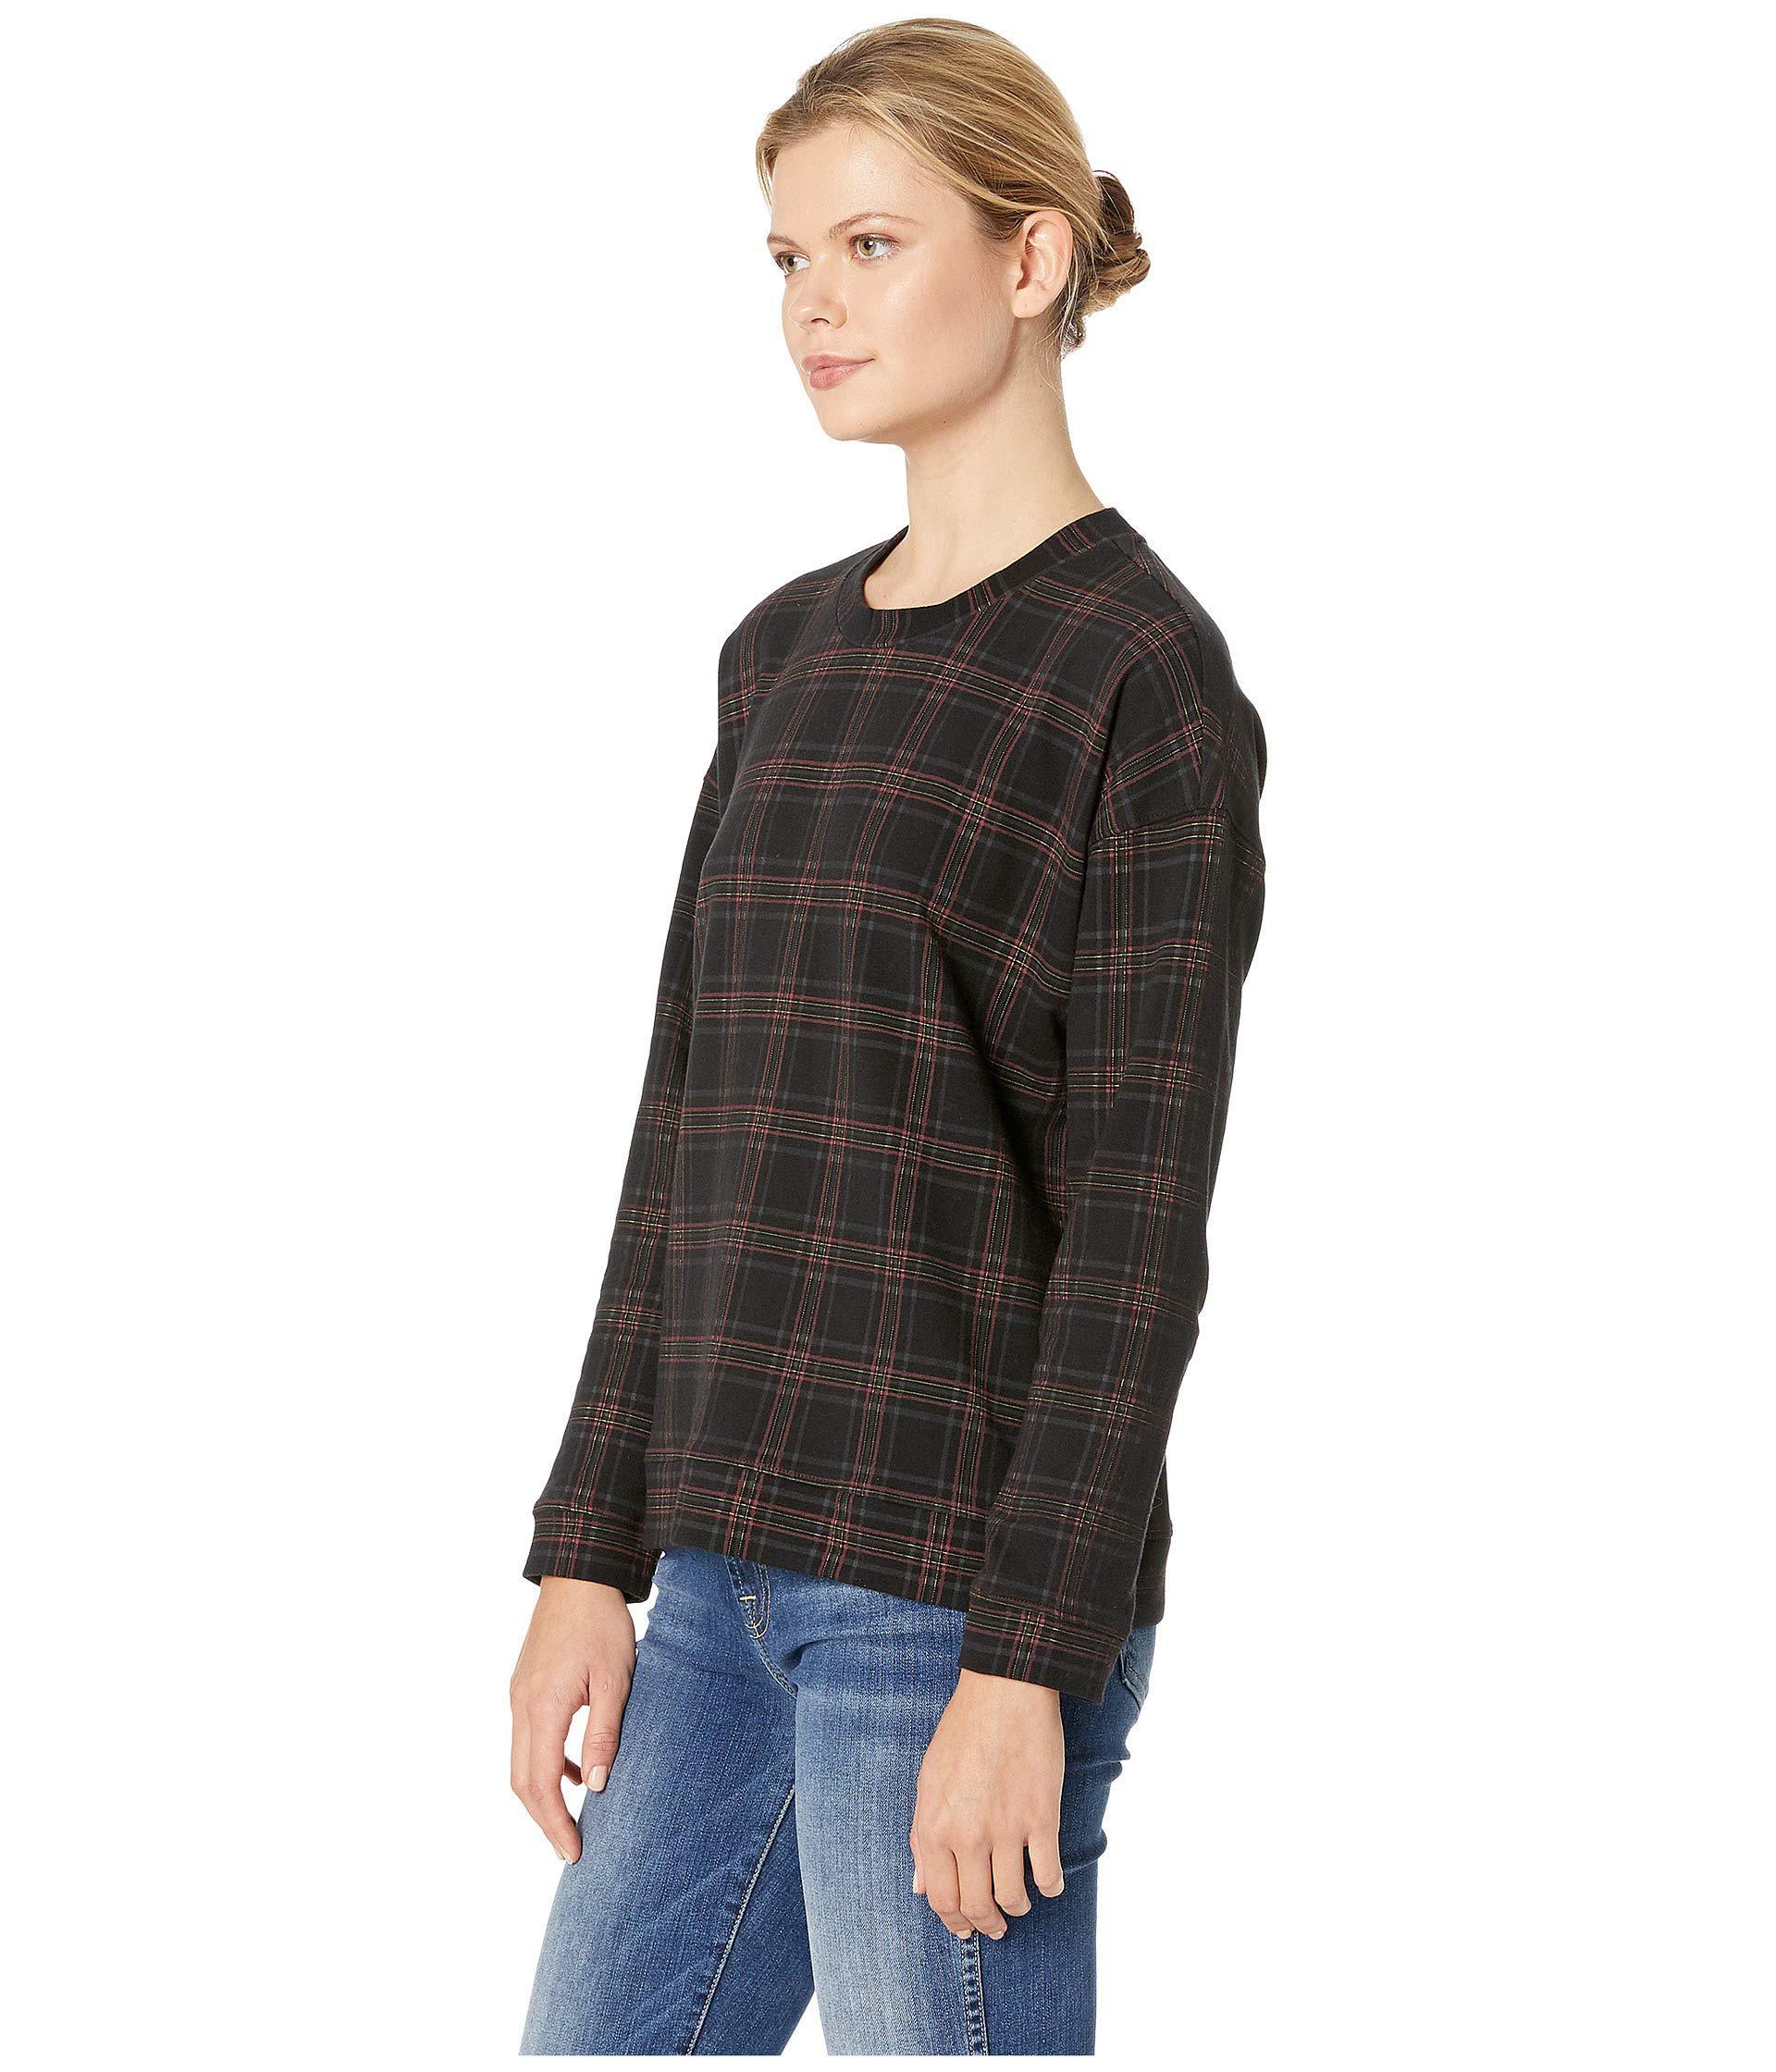 44c66acc1cf9e Lyst - Kenneth Cole Printed Sweatshirt (road Plaid Black) Women s Sweatshirt  in Black